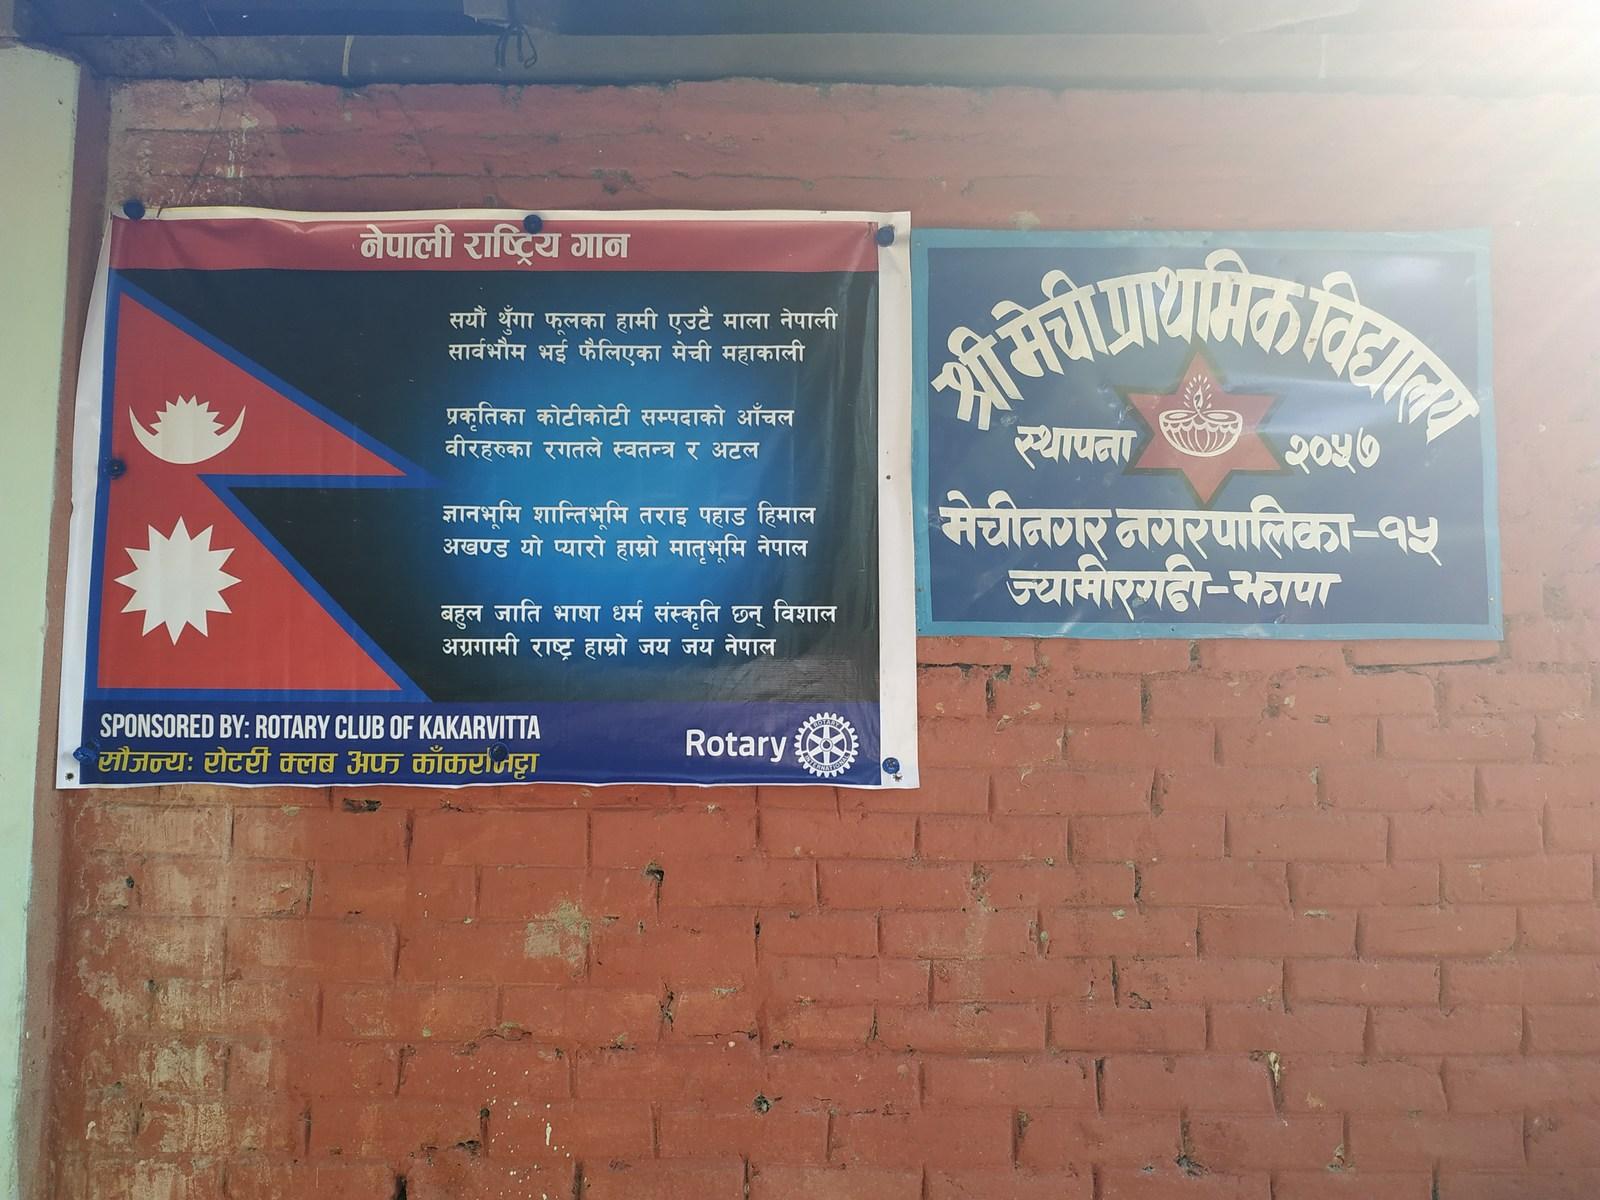 Free-Health-Camp-Eye-Screening-at-Gwala-Basti-Mechinagar-15-Jhapa-Nepal-Rotary-Club-of-Kakarvitta-40